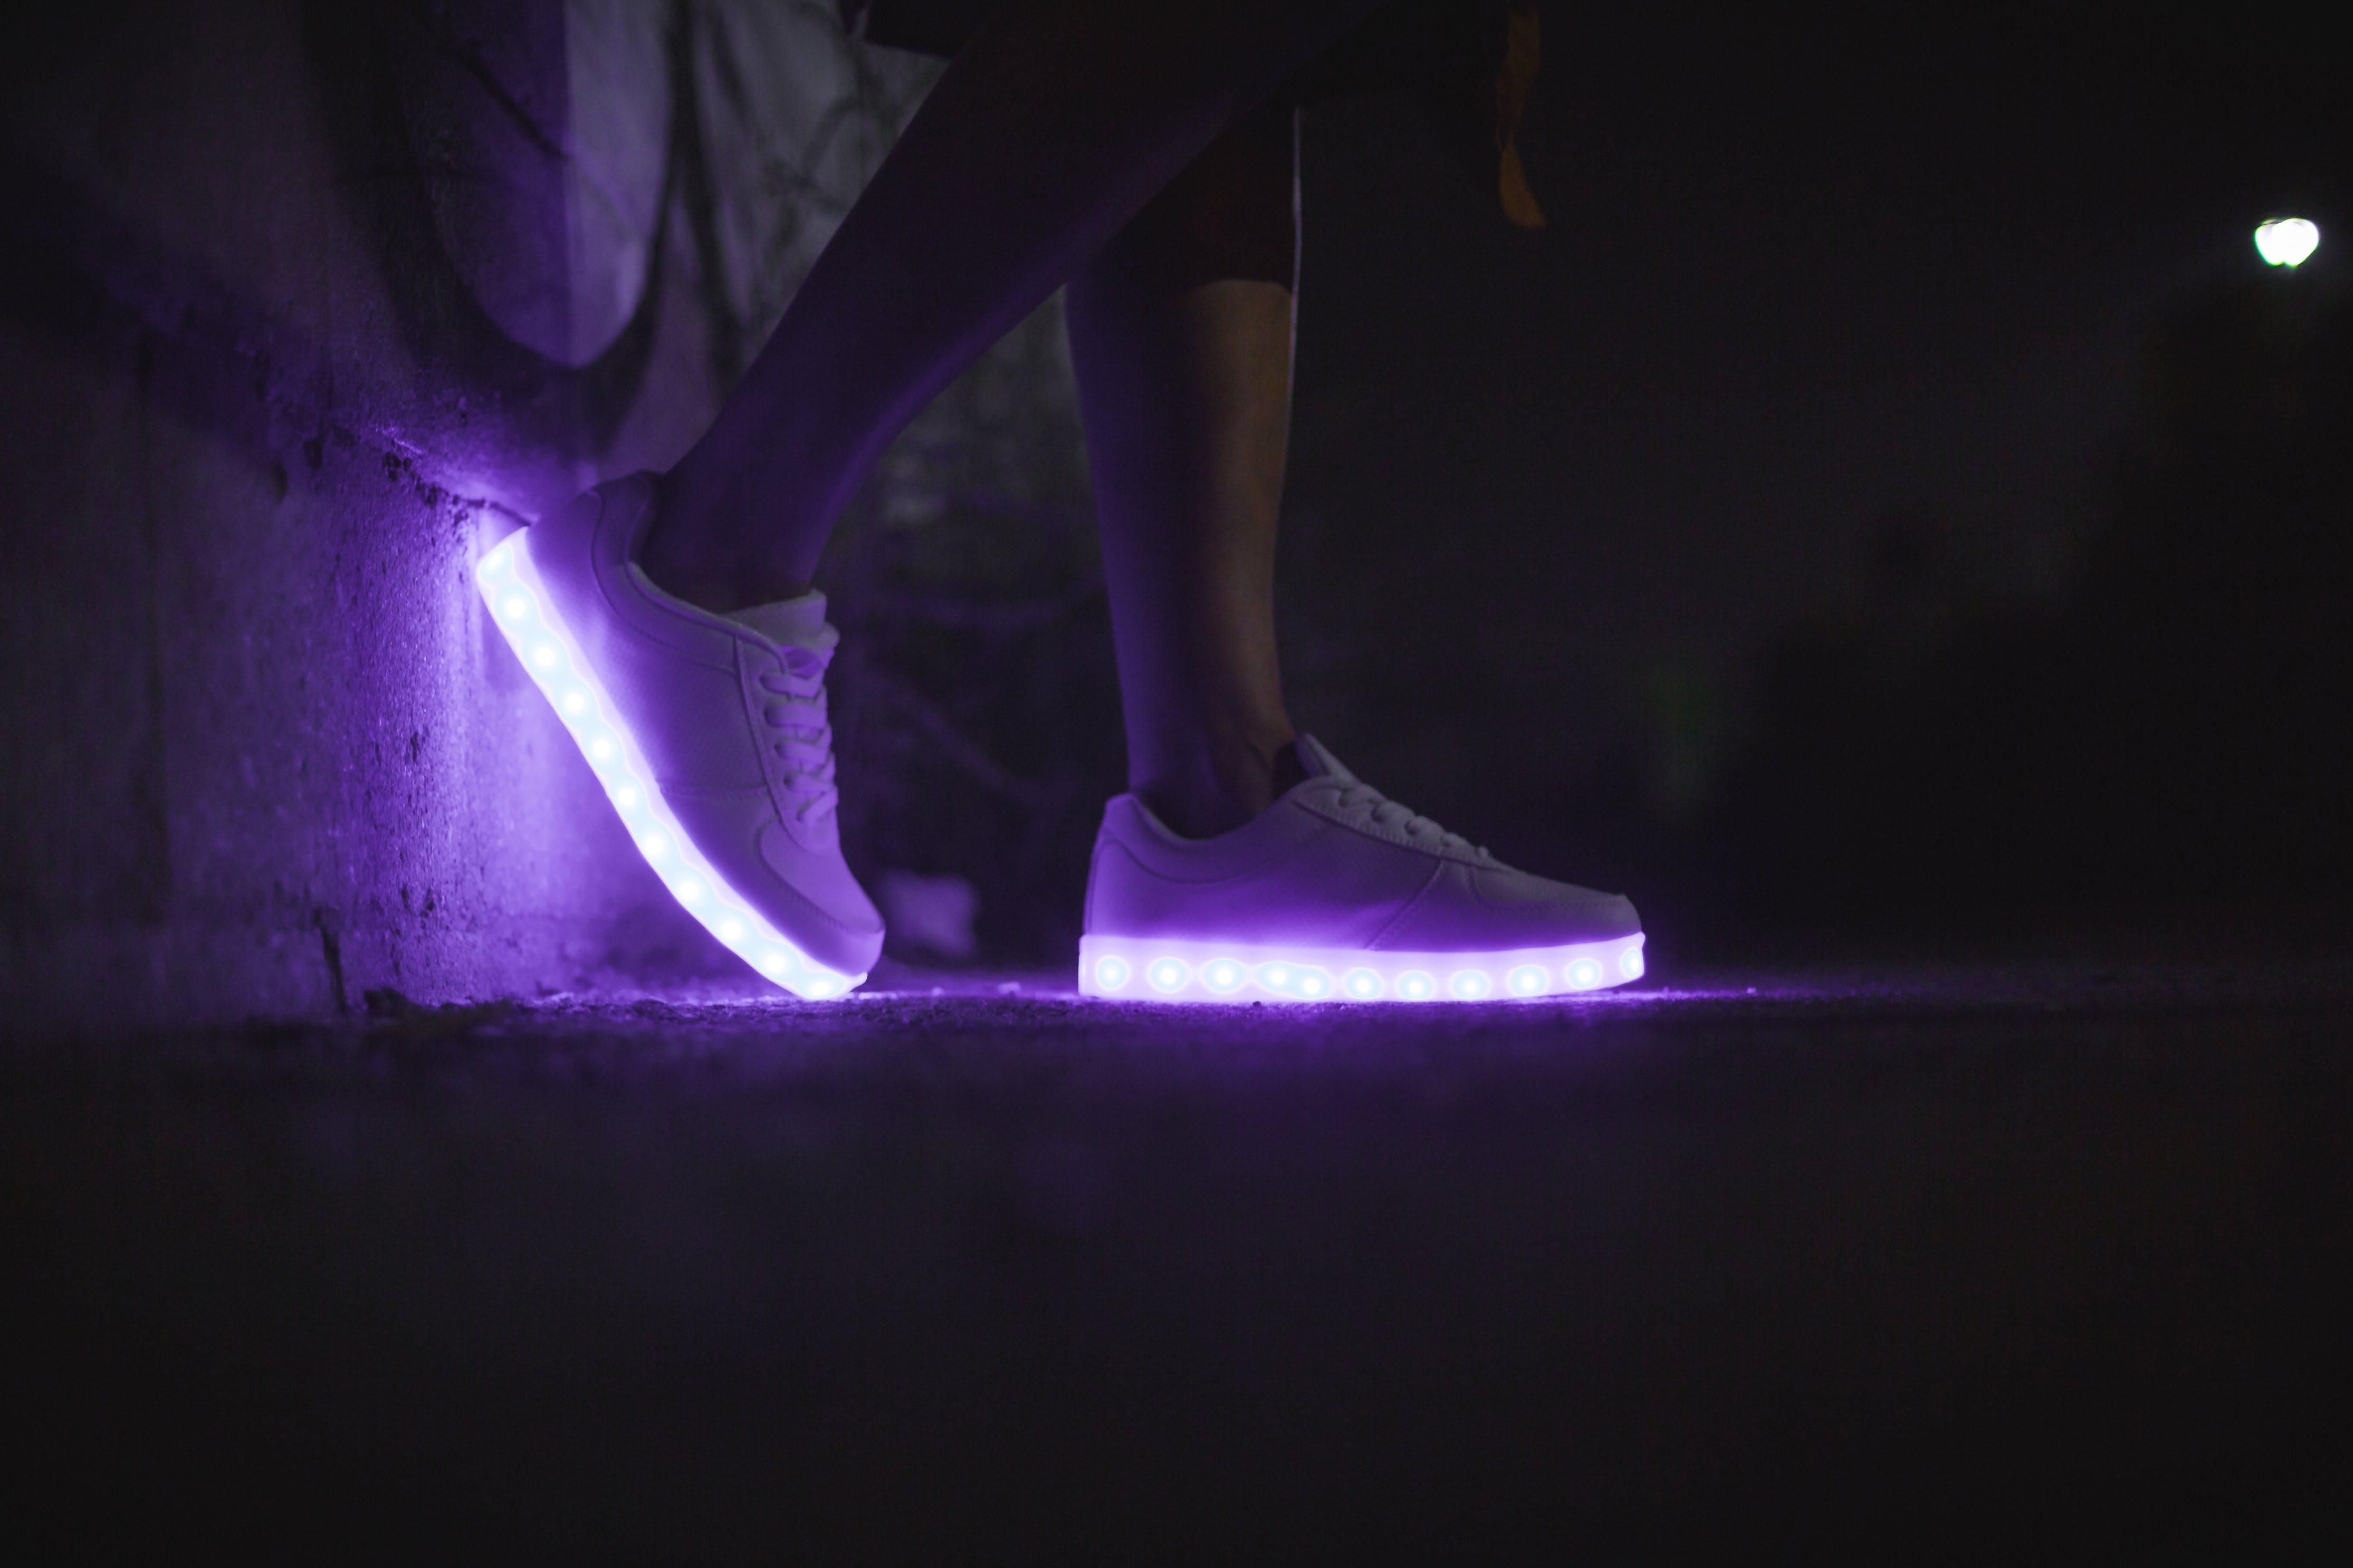 Free stock photo of light, night, feet, dark